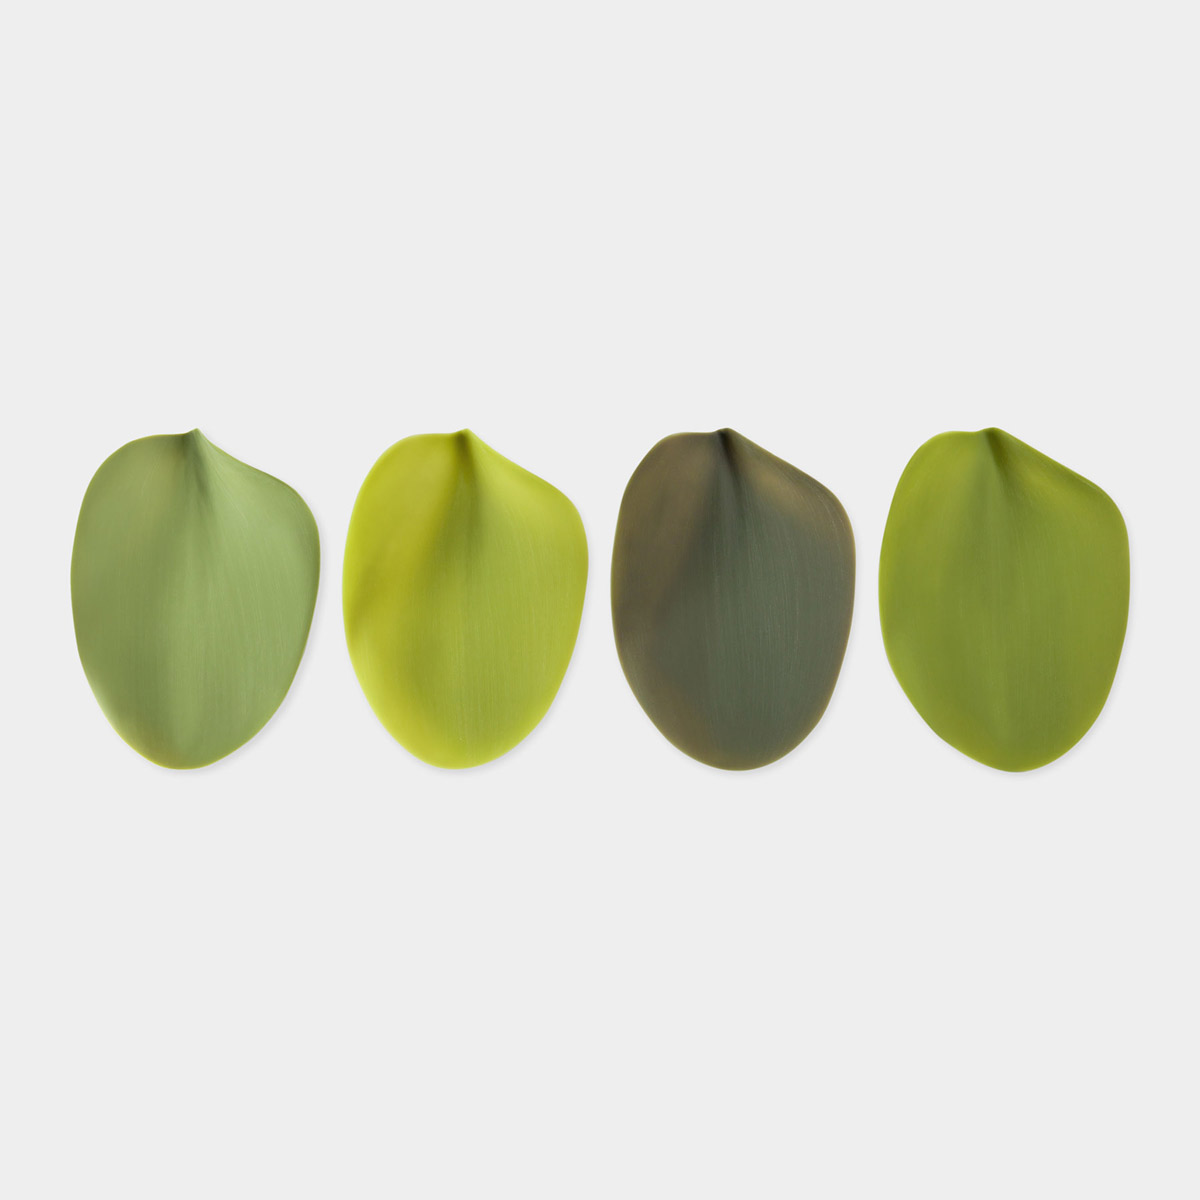 Silicone Leaf Plates & Silicone Leaf Plates - The Green Head